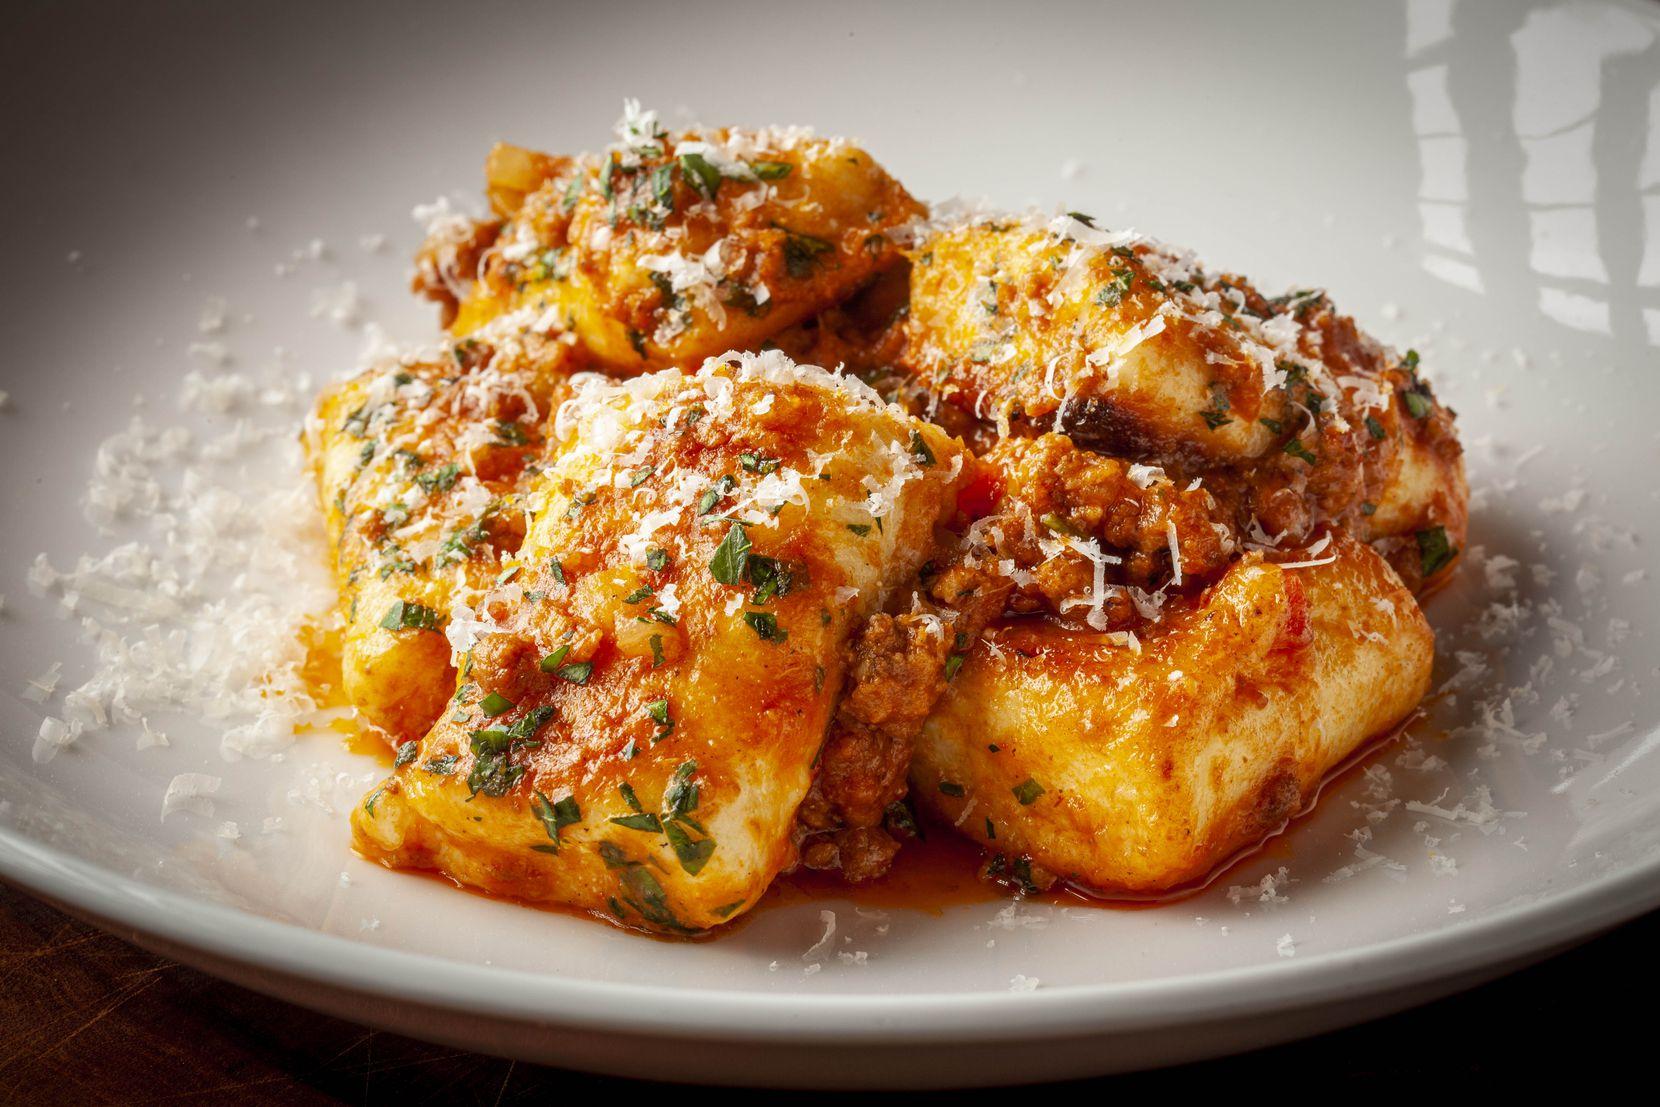 Sauteéd Ricotta Gnocchi With Bolognese from Black Cur Steak